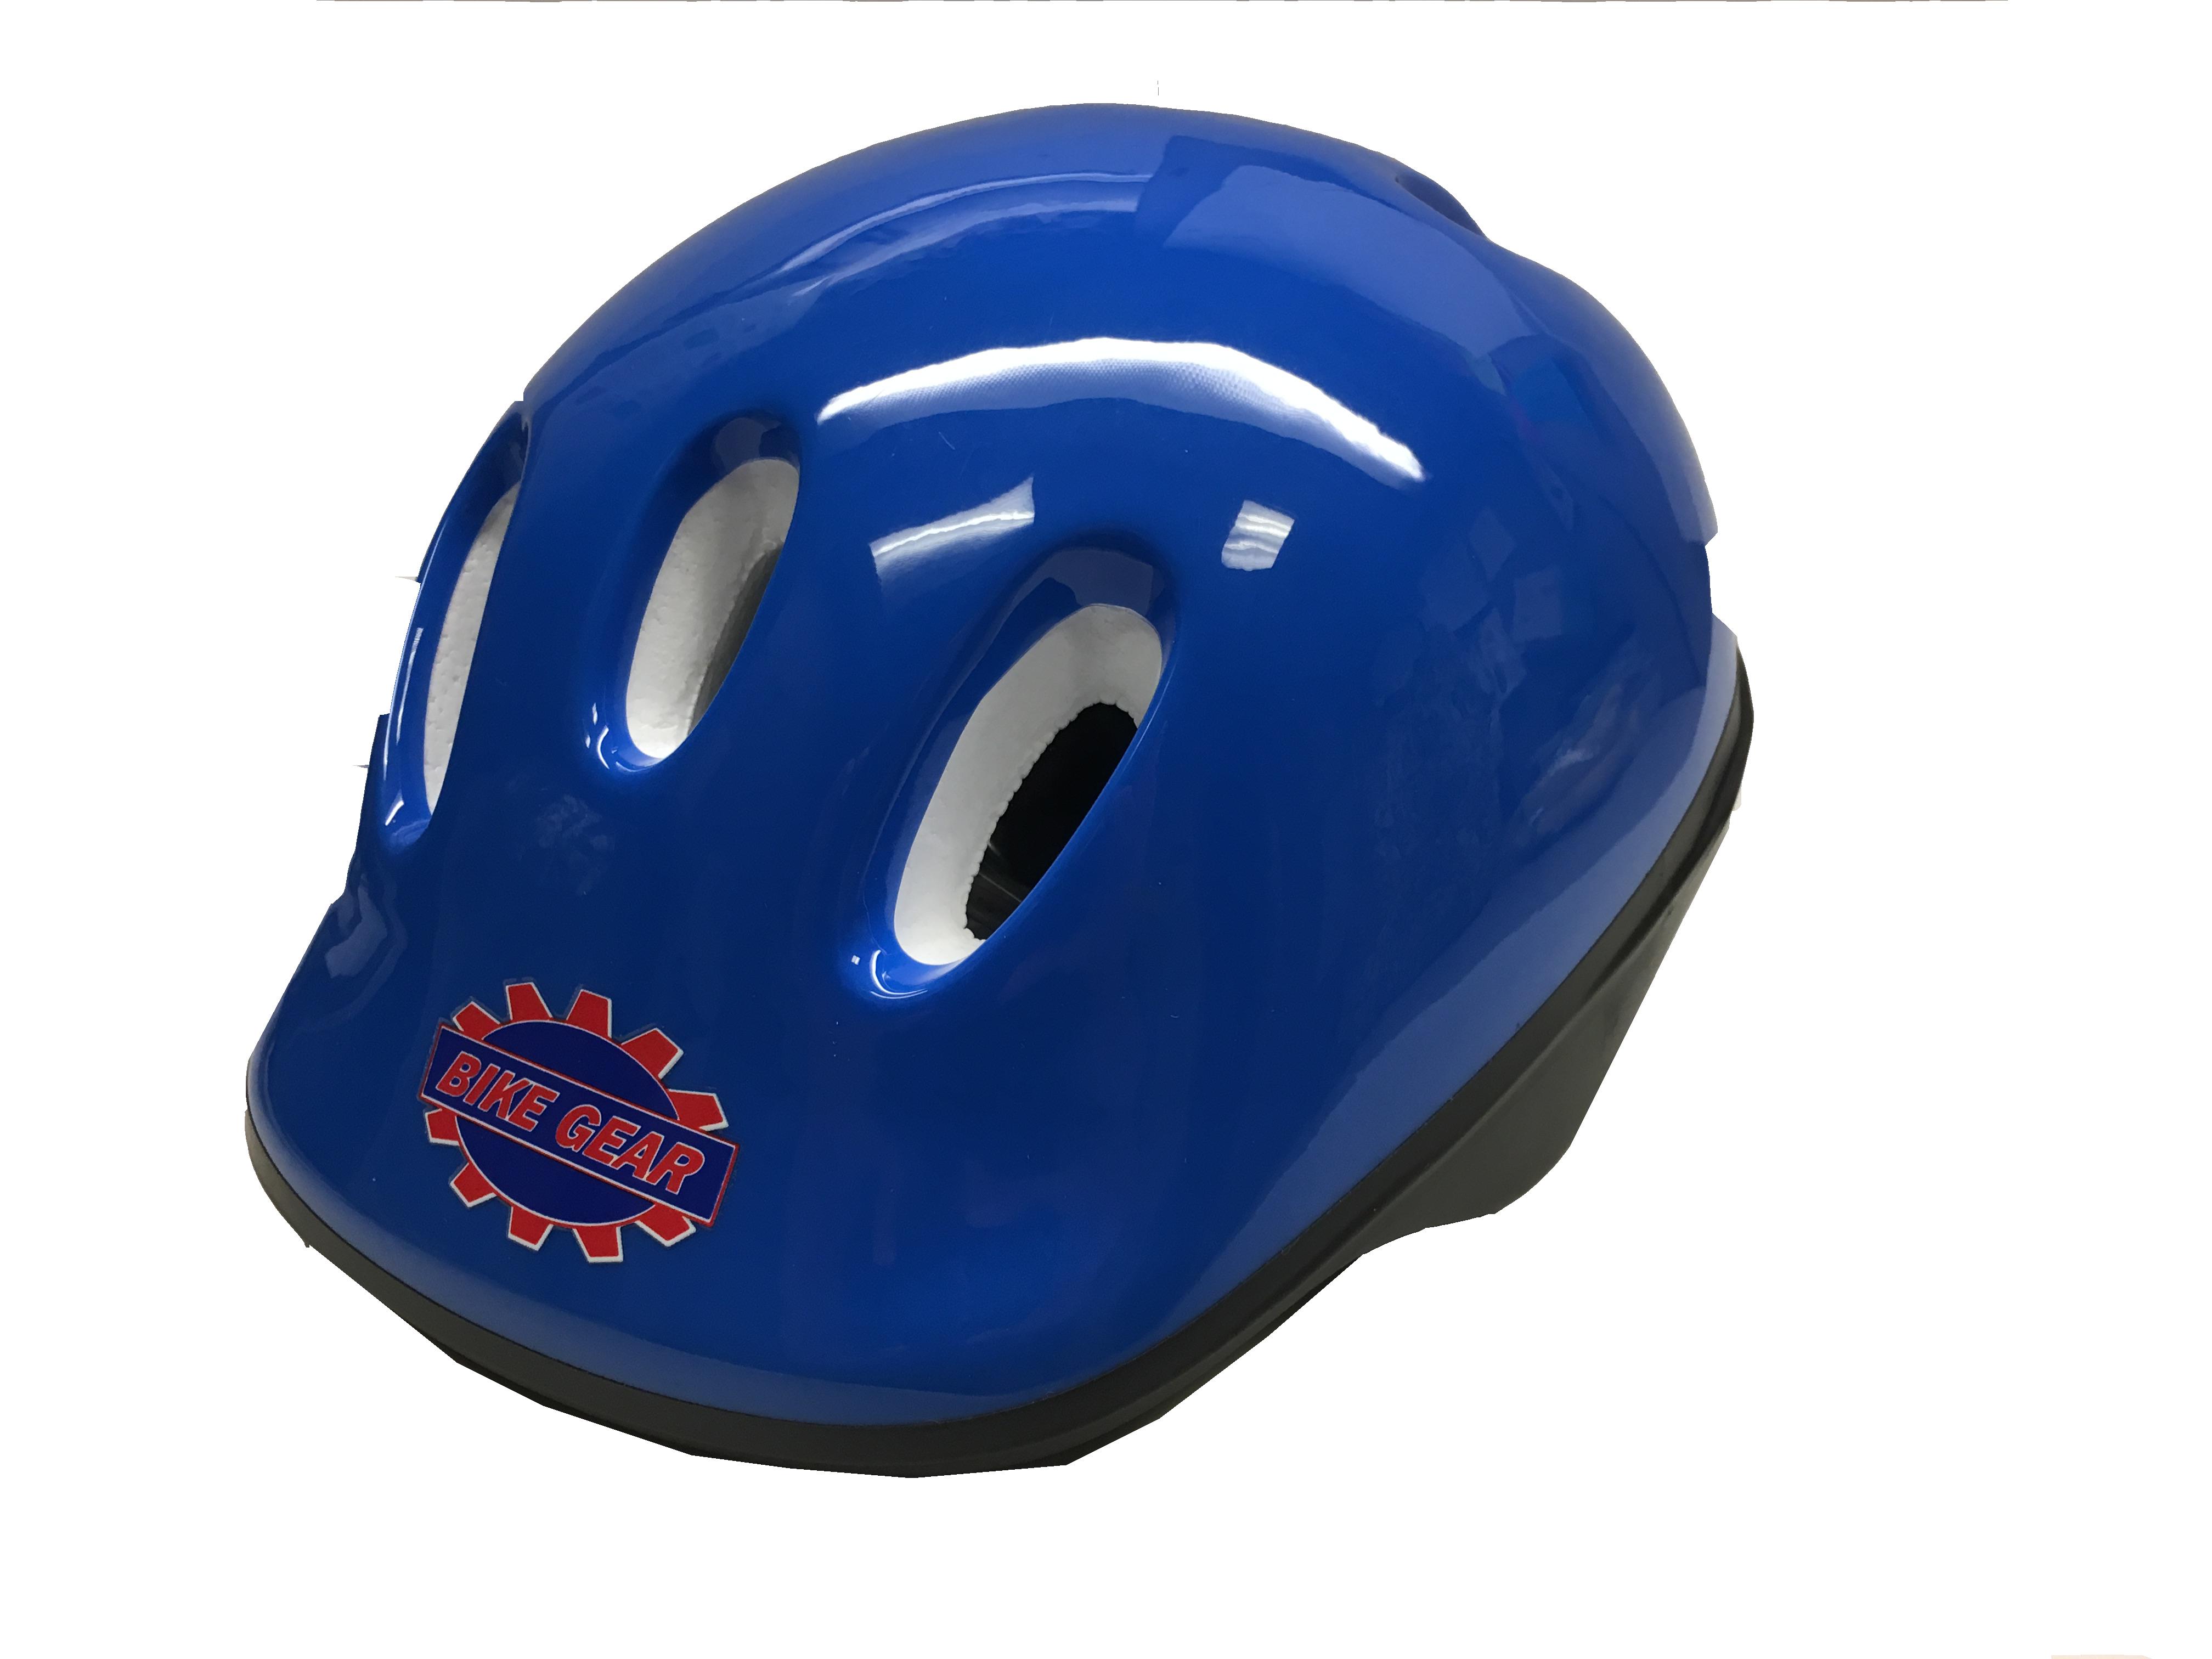 Toddler Safety Helmet